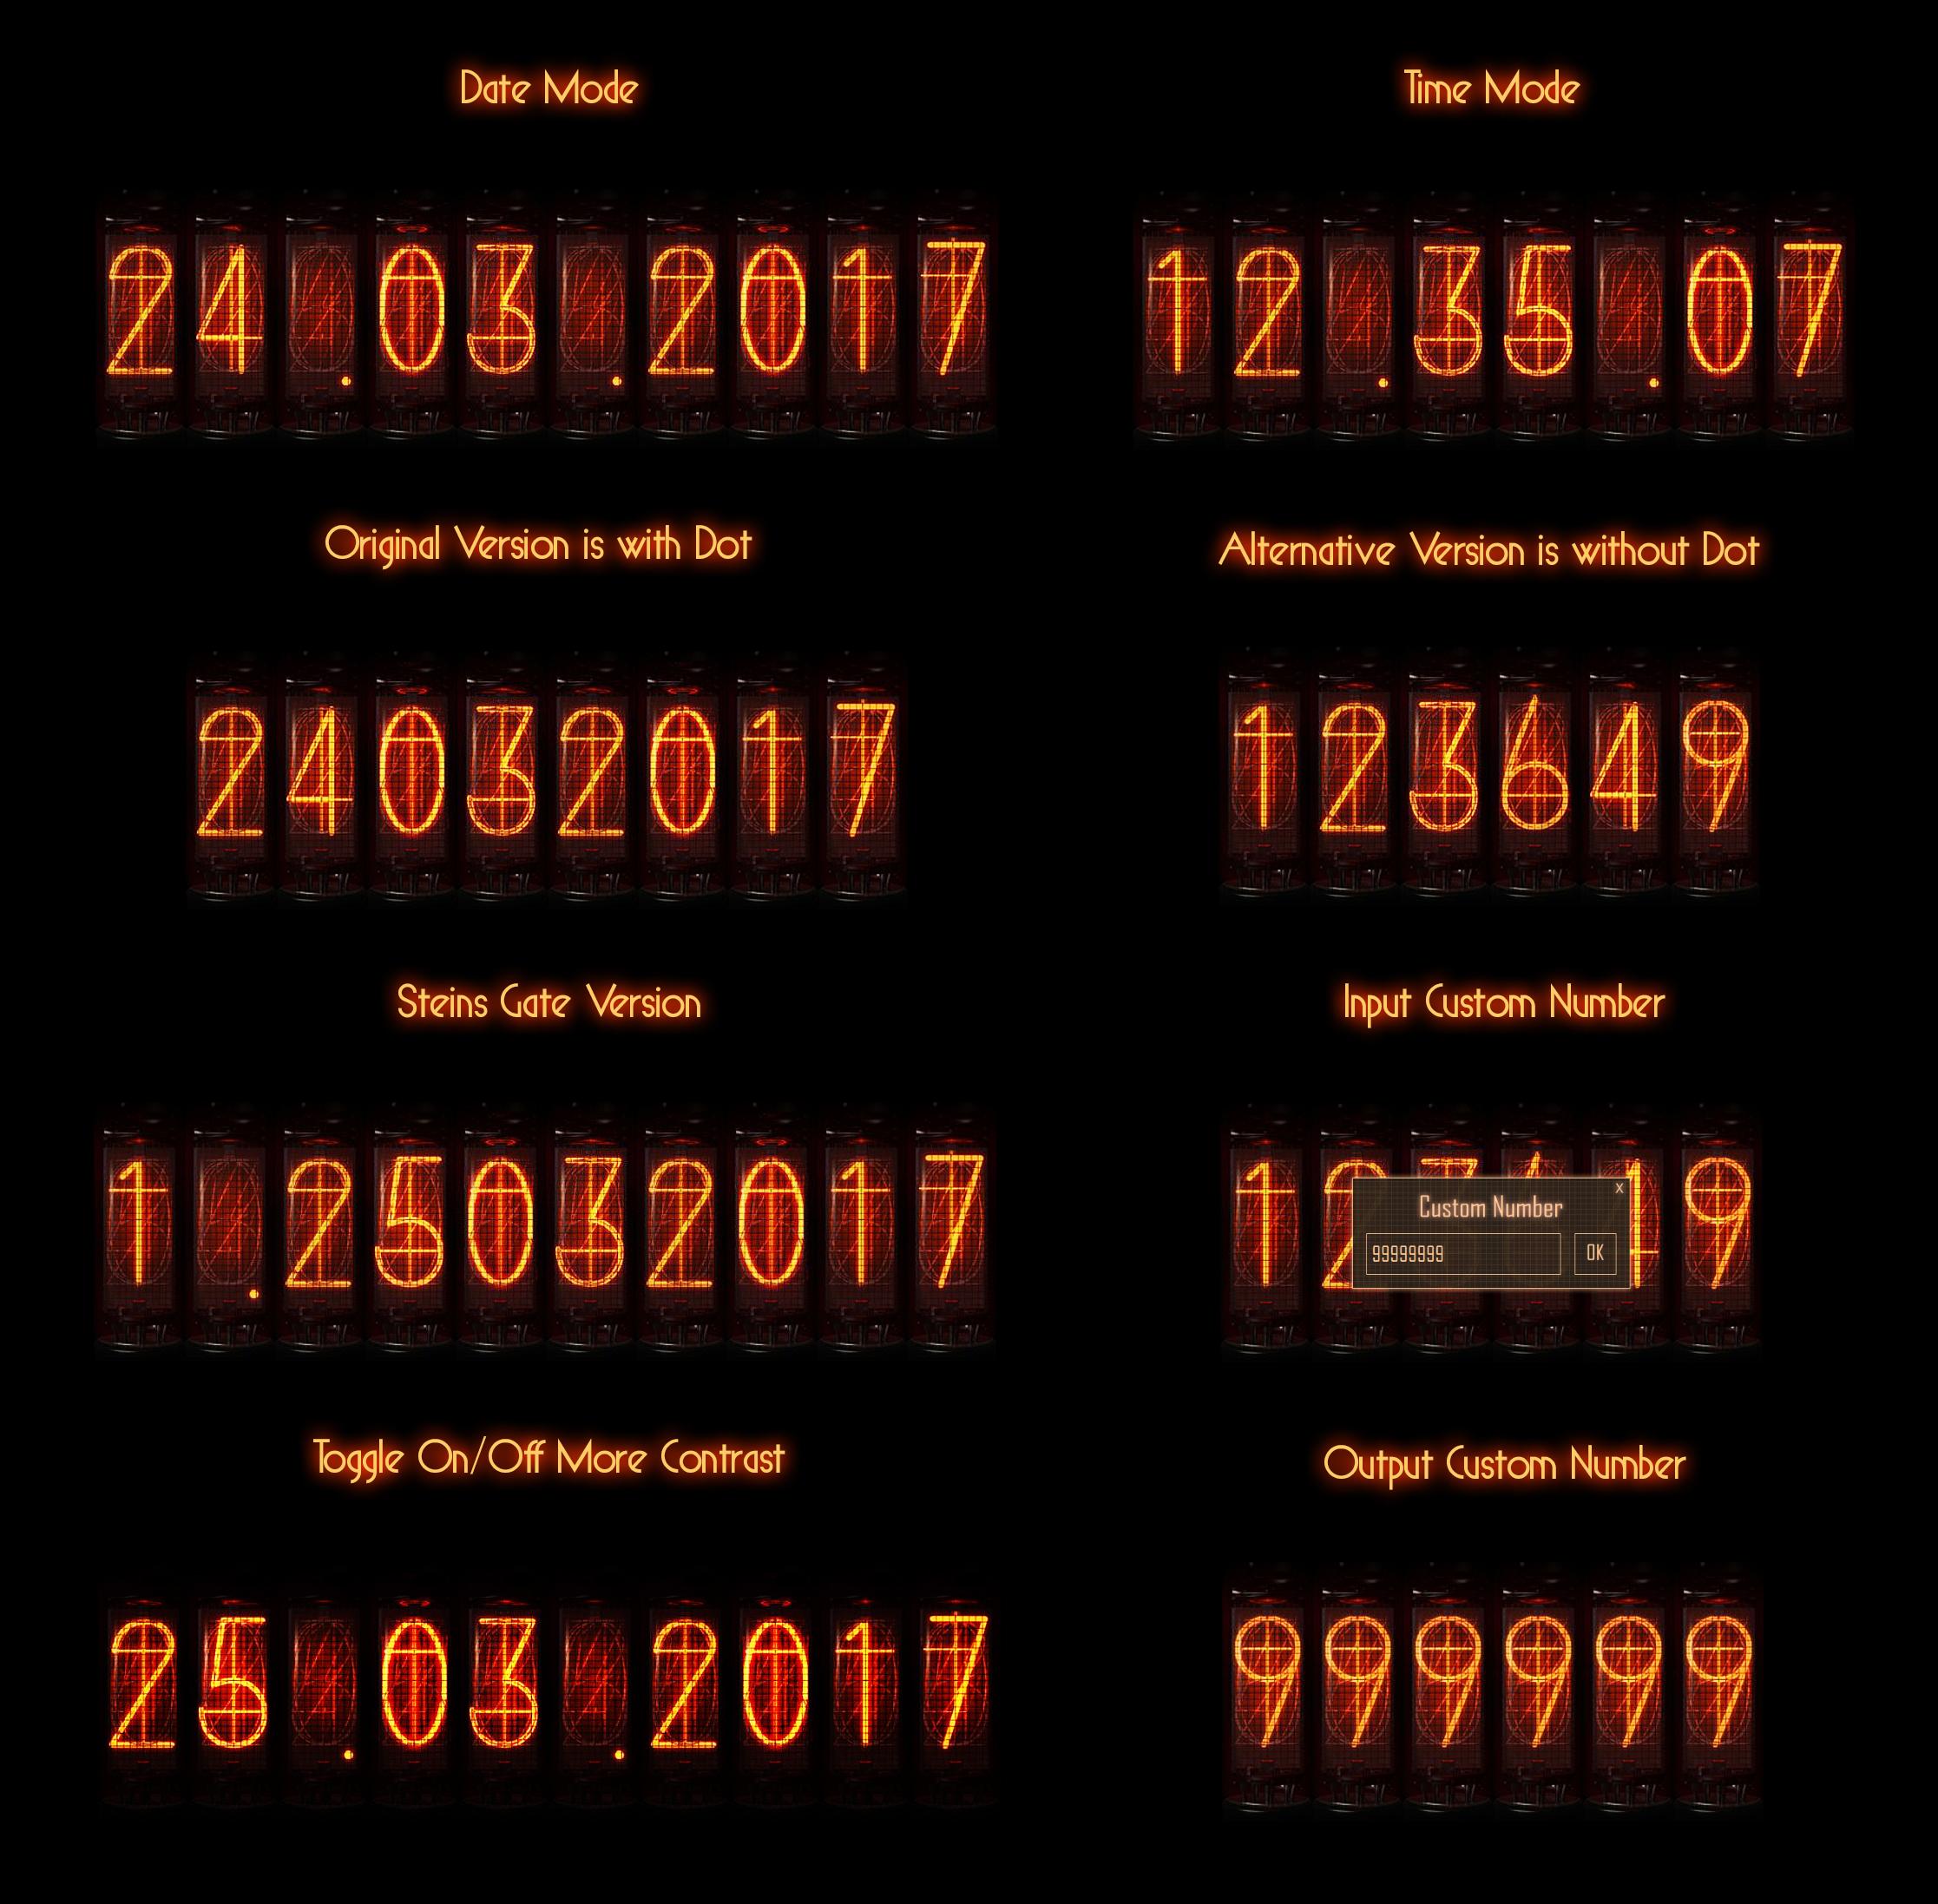 Nixie Tube Steins Gate Date Time By Adiim On Deviantart